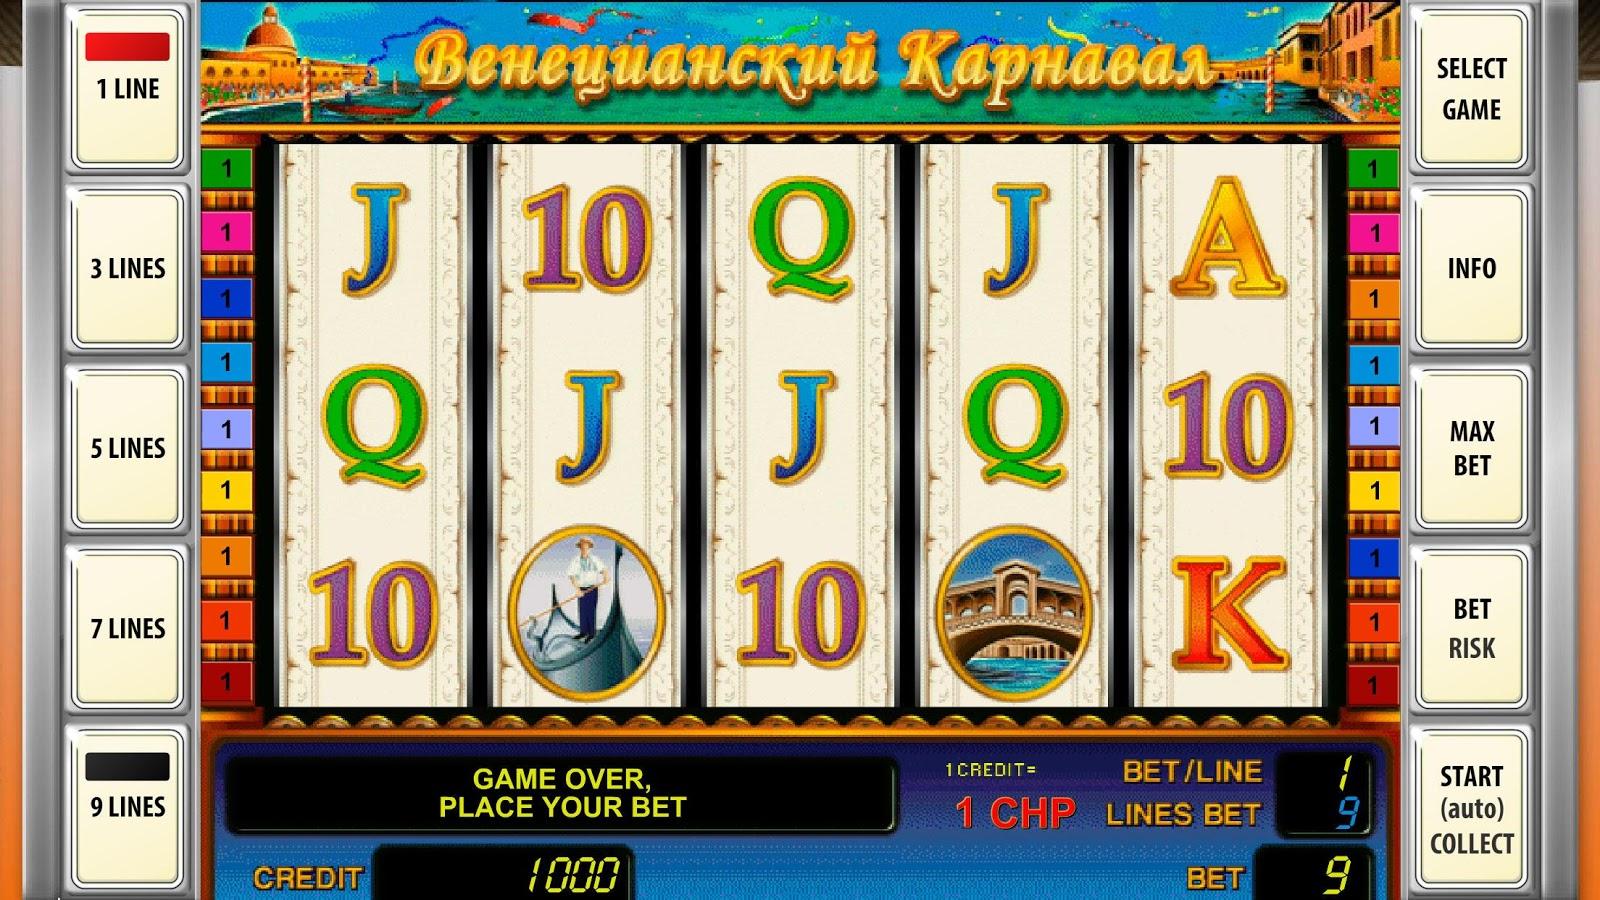 Gambling credit line gambling games toys